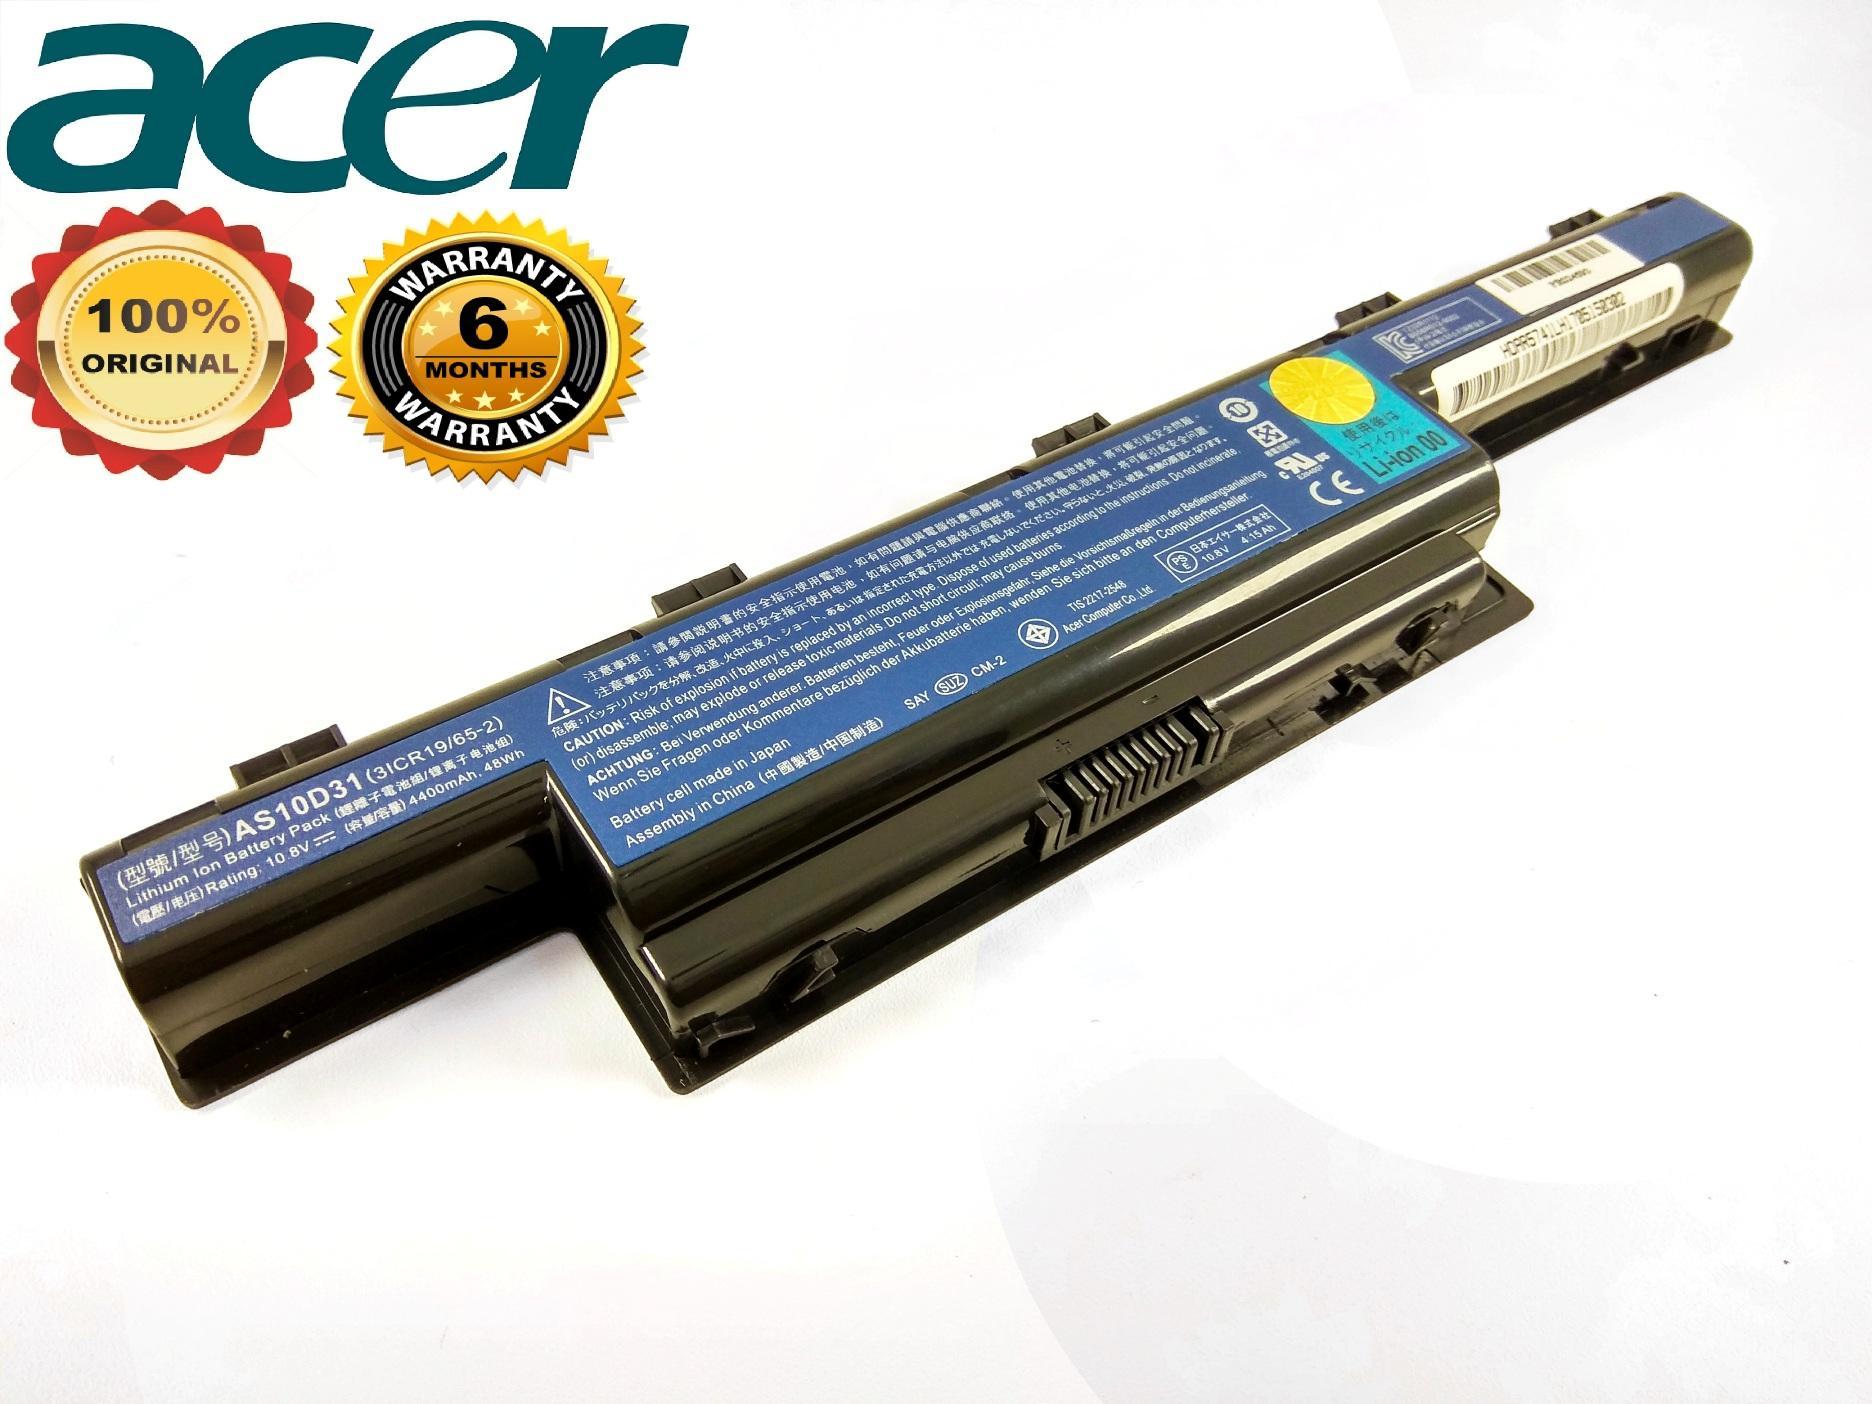 ACER Baterai ORI Laptop 4738 4741 4551G 4738Z 5740G 5741G E-1431 E1-471 ORI